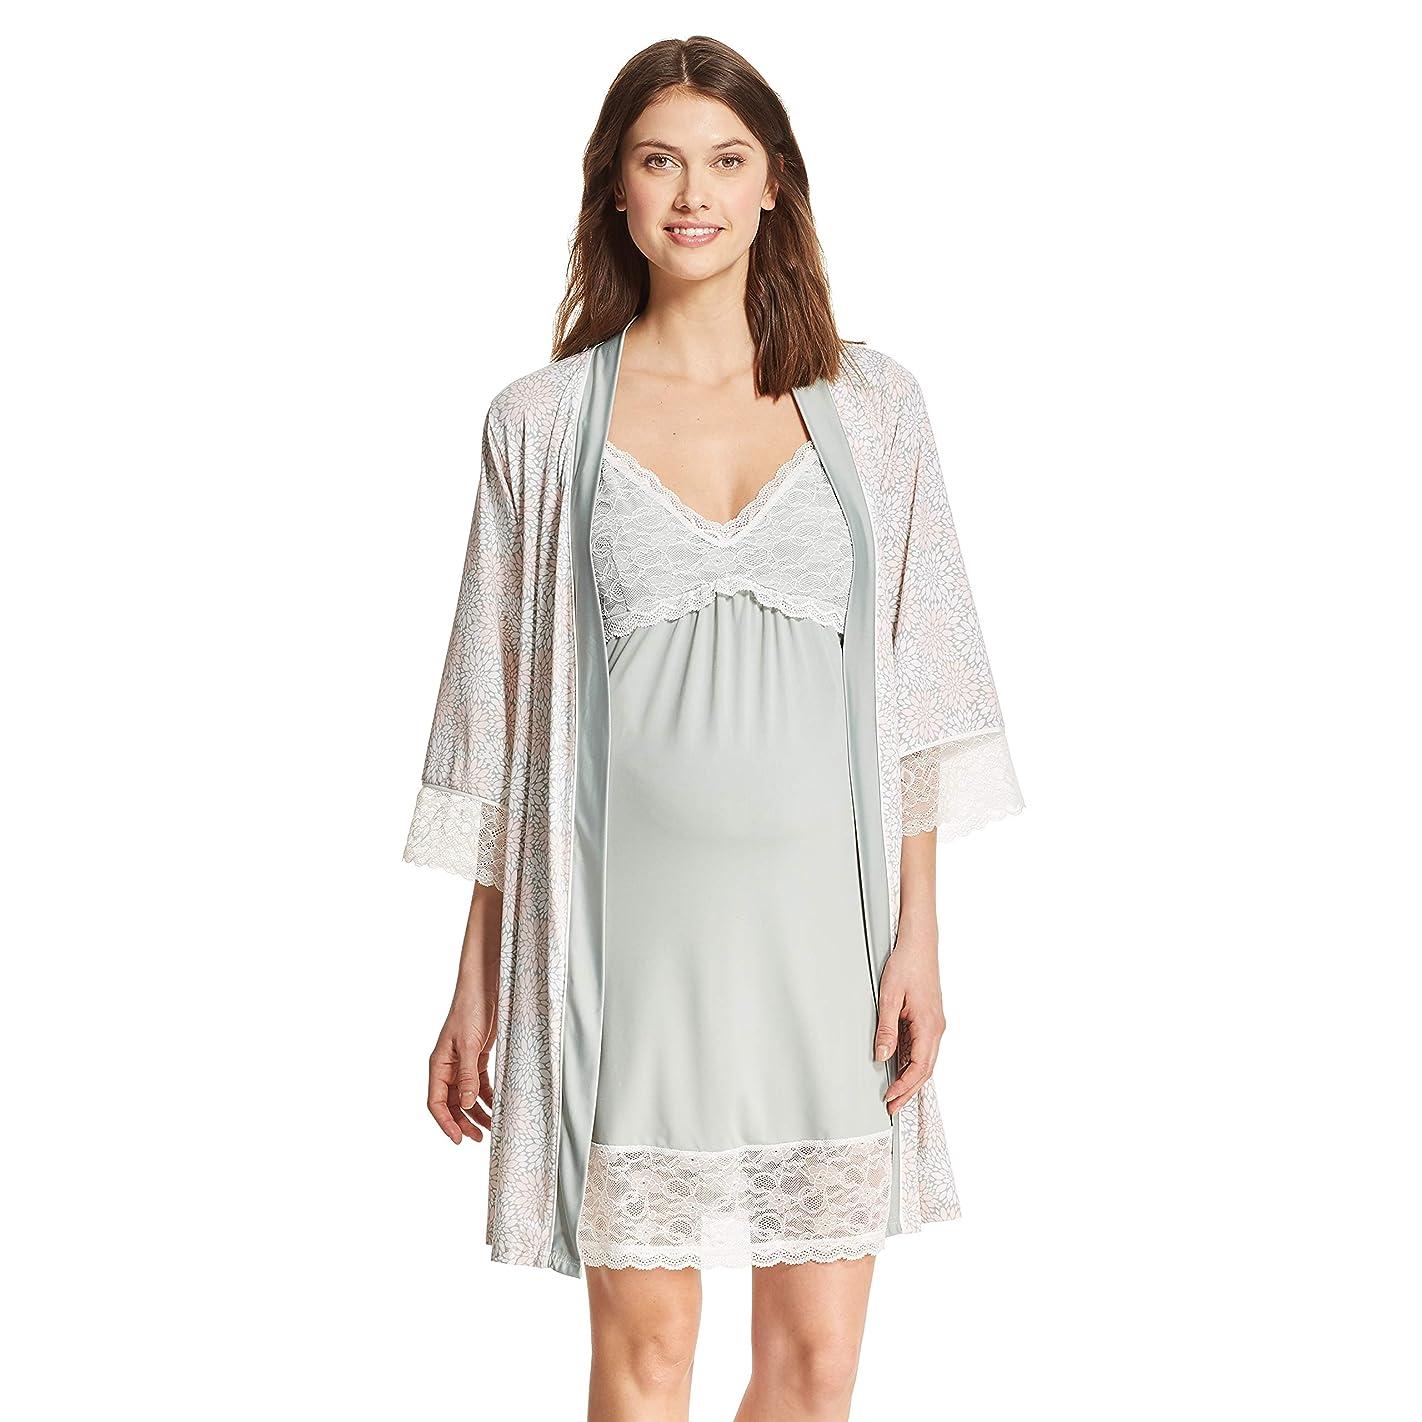 Nanette Lepore Womens?Maternity 2 Piece Nursing Nightgown and Robe Pajama Lounge Set s33336818155